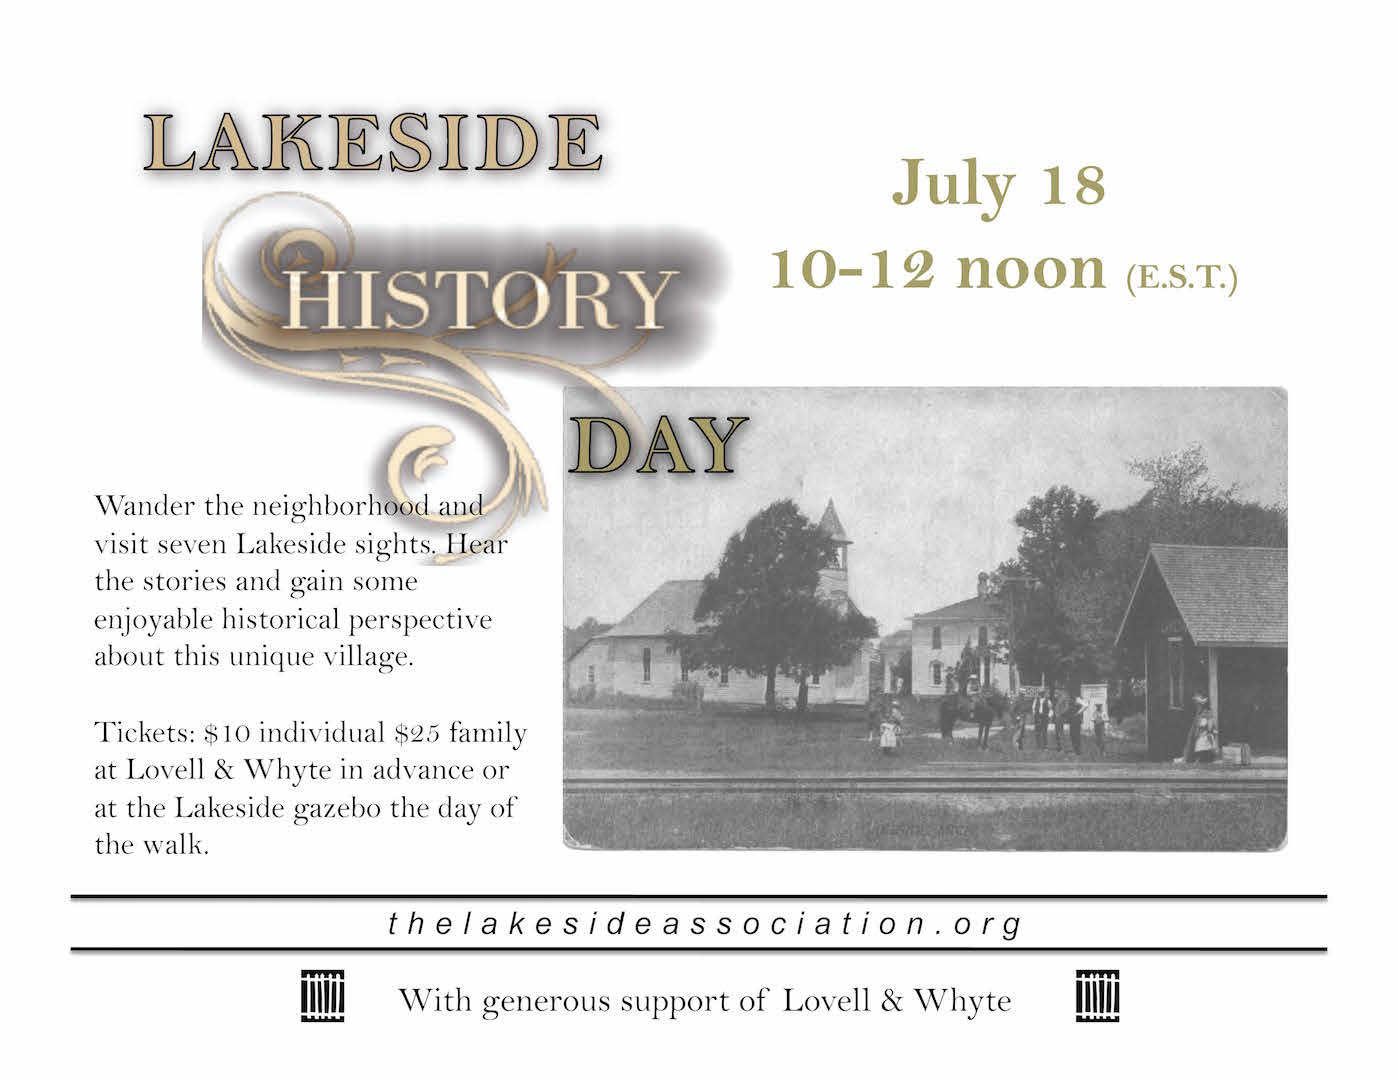 PR_Lakeside History Day_Flyer_SM.jpg